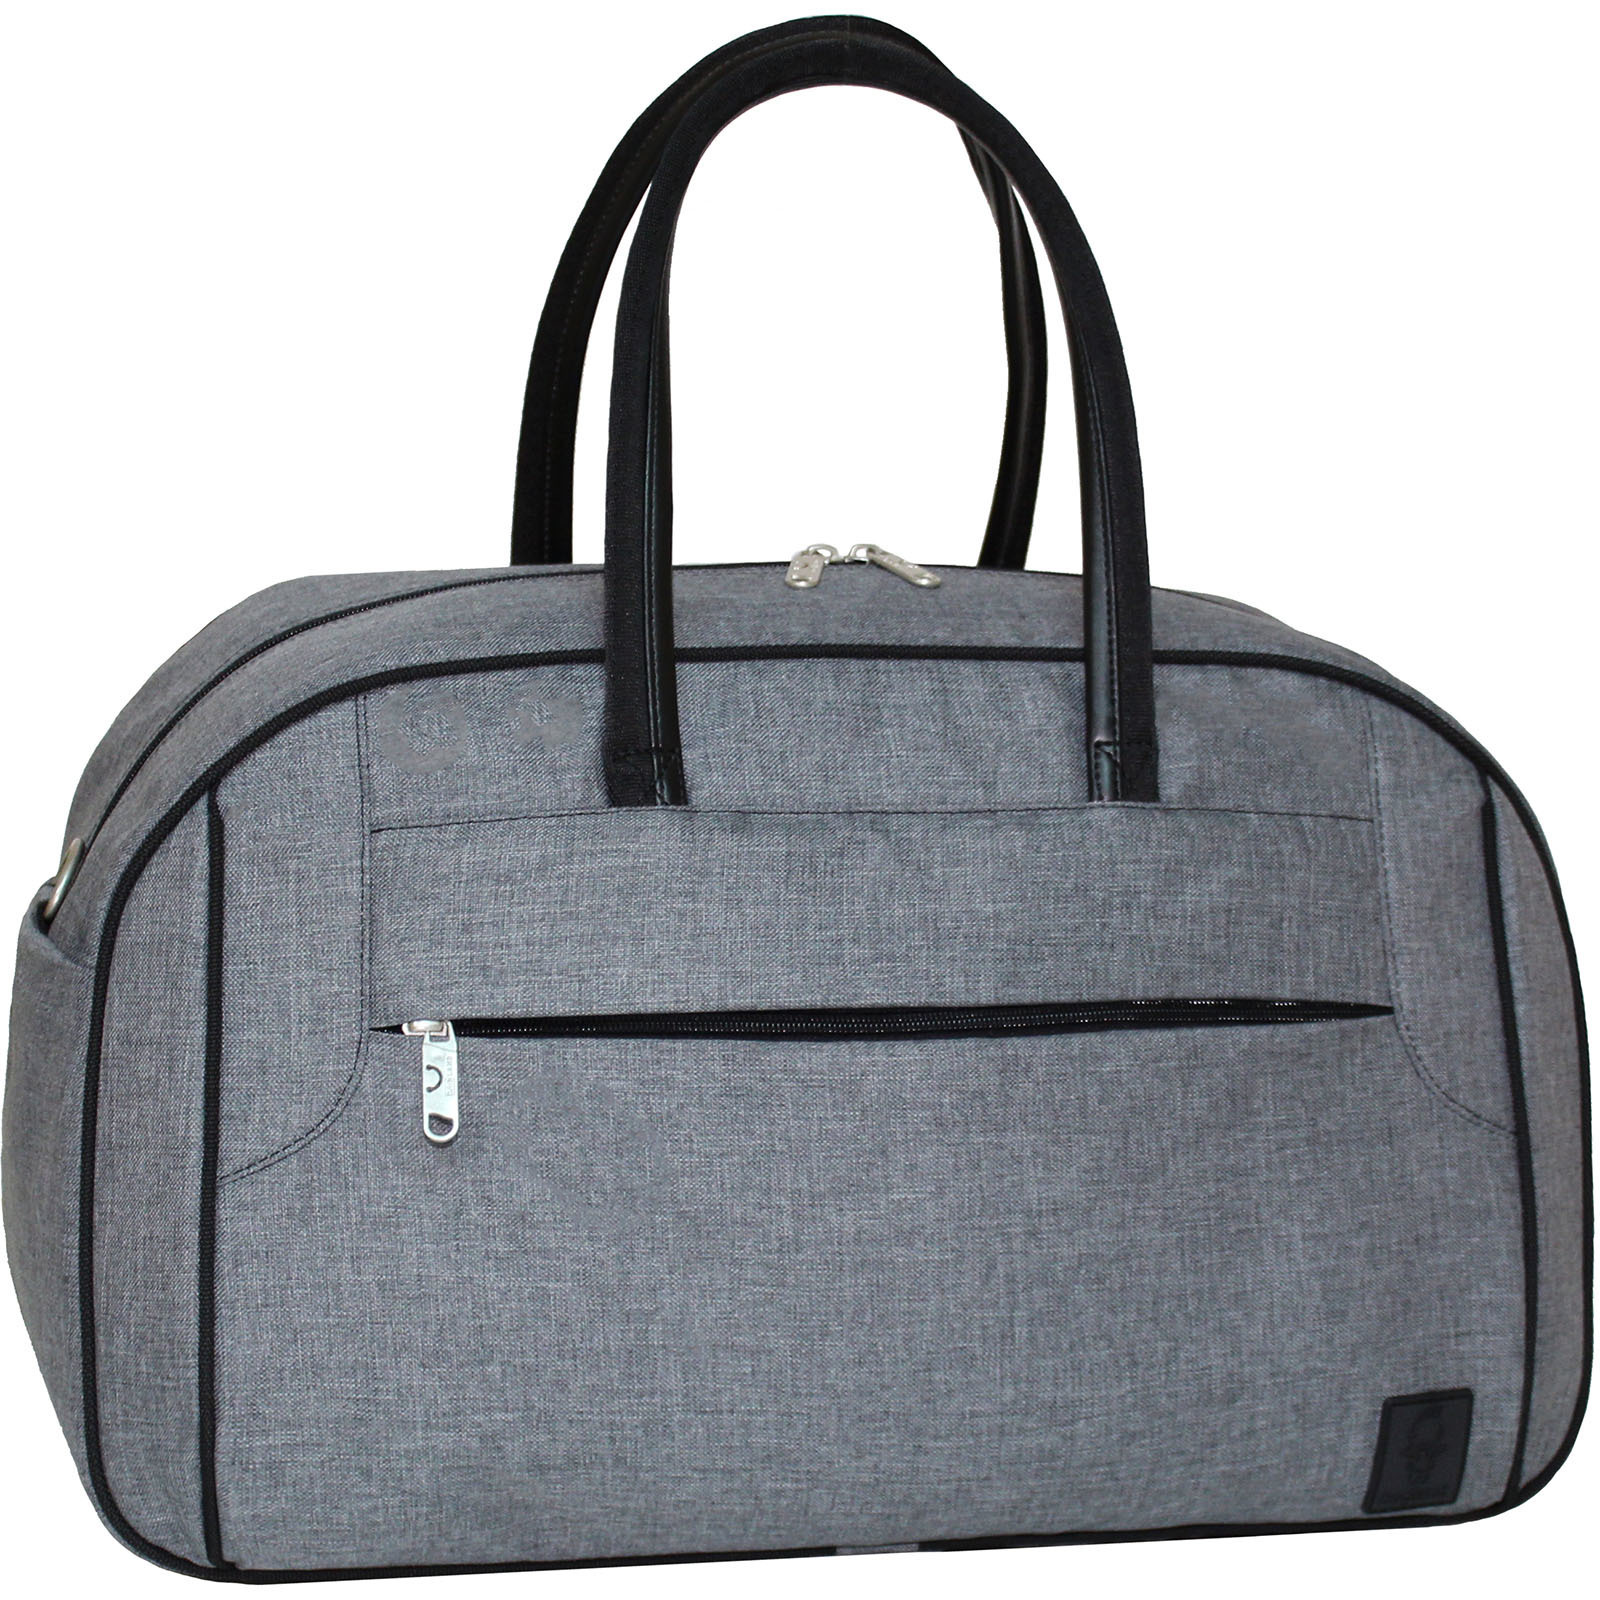 Дорожные сумки Сумка Bagland Тунис 34 л. Серый (0039069) IMG_2009.JPG